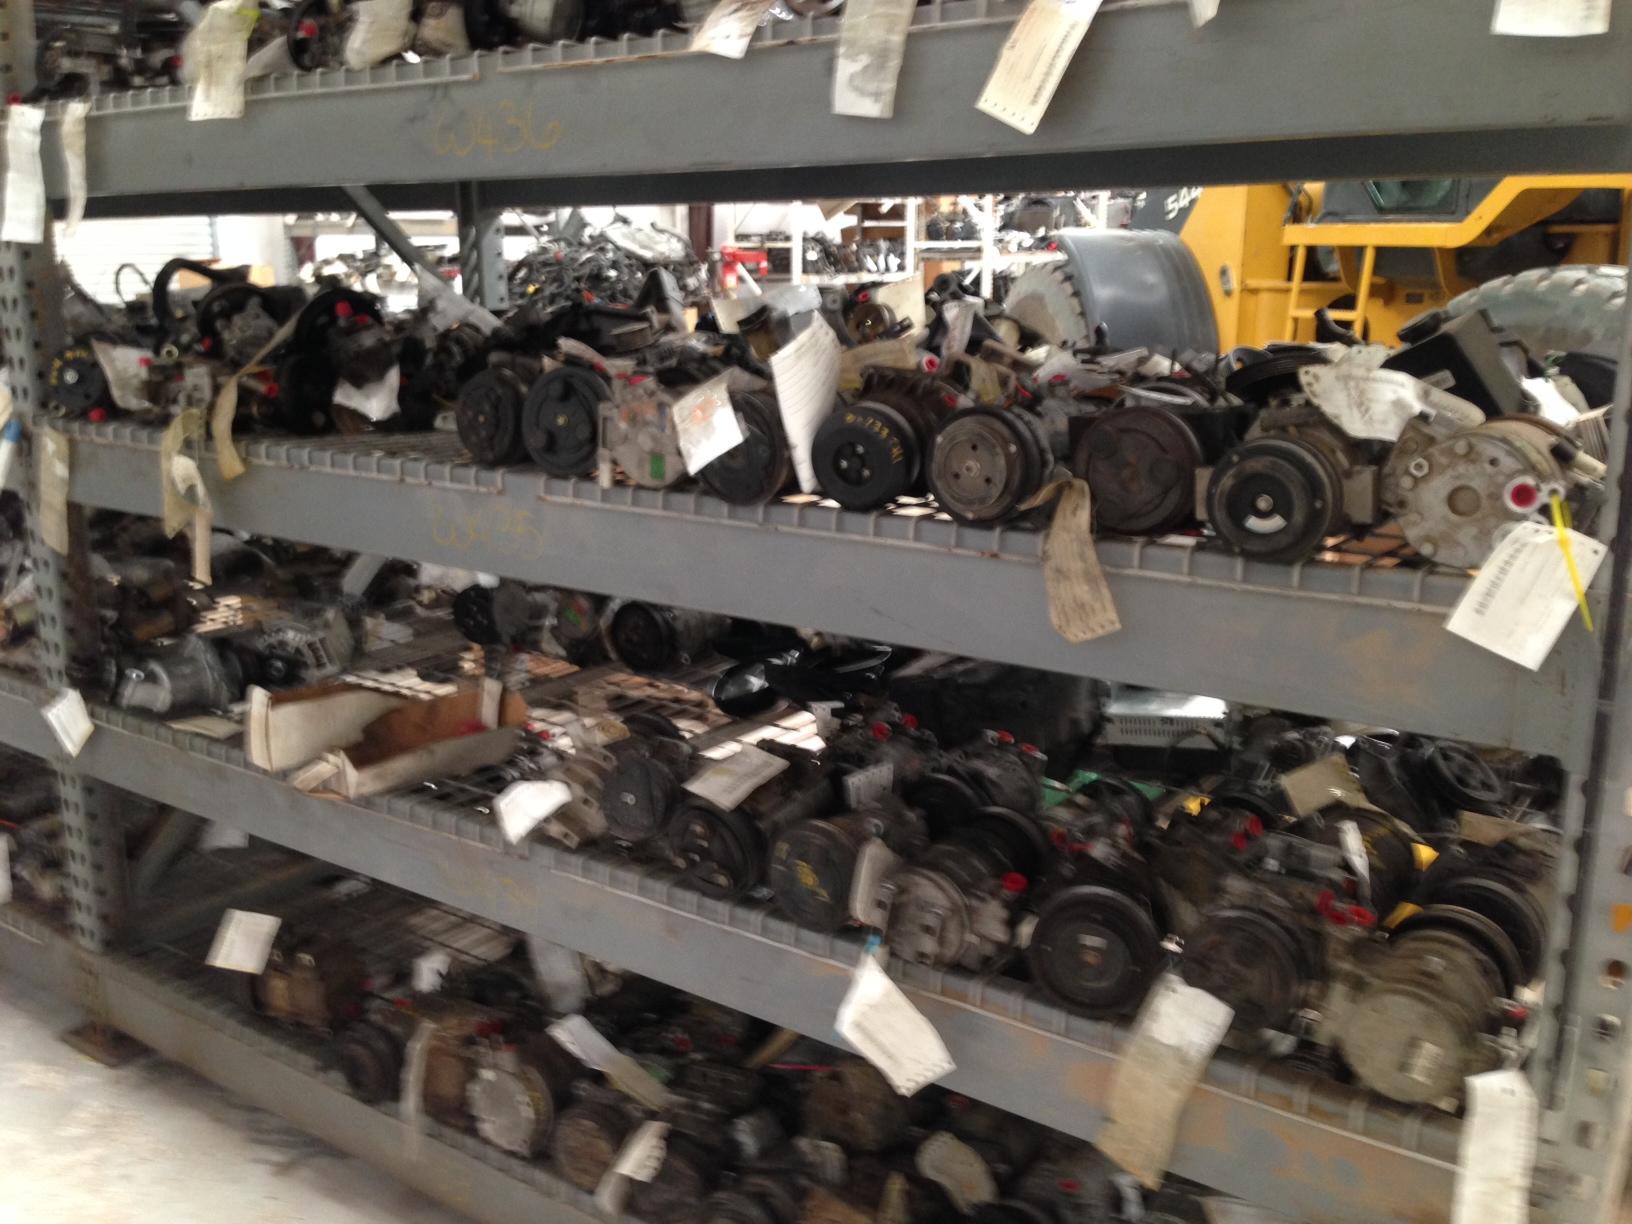 A/C Compressors, Starters, Alternators & Much More